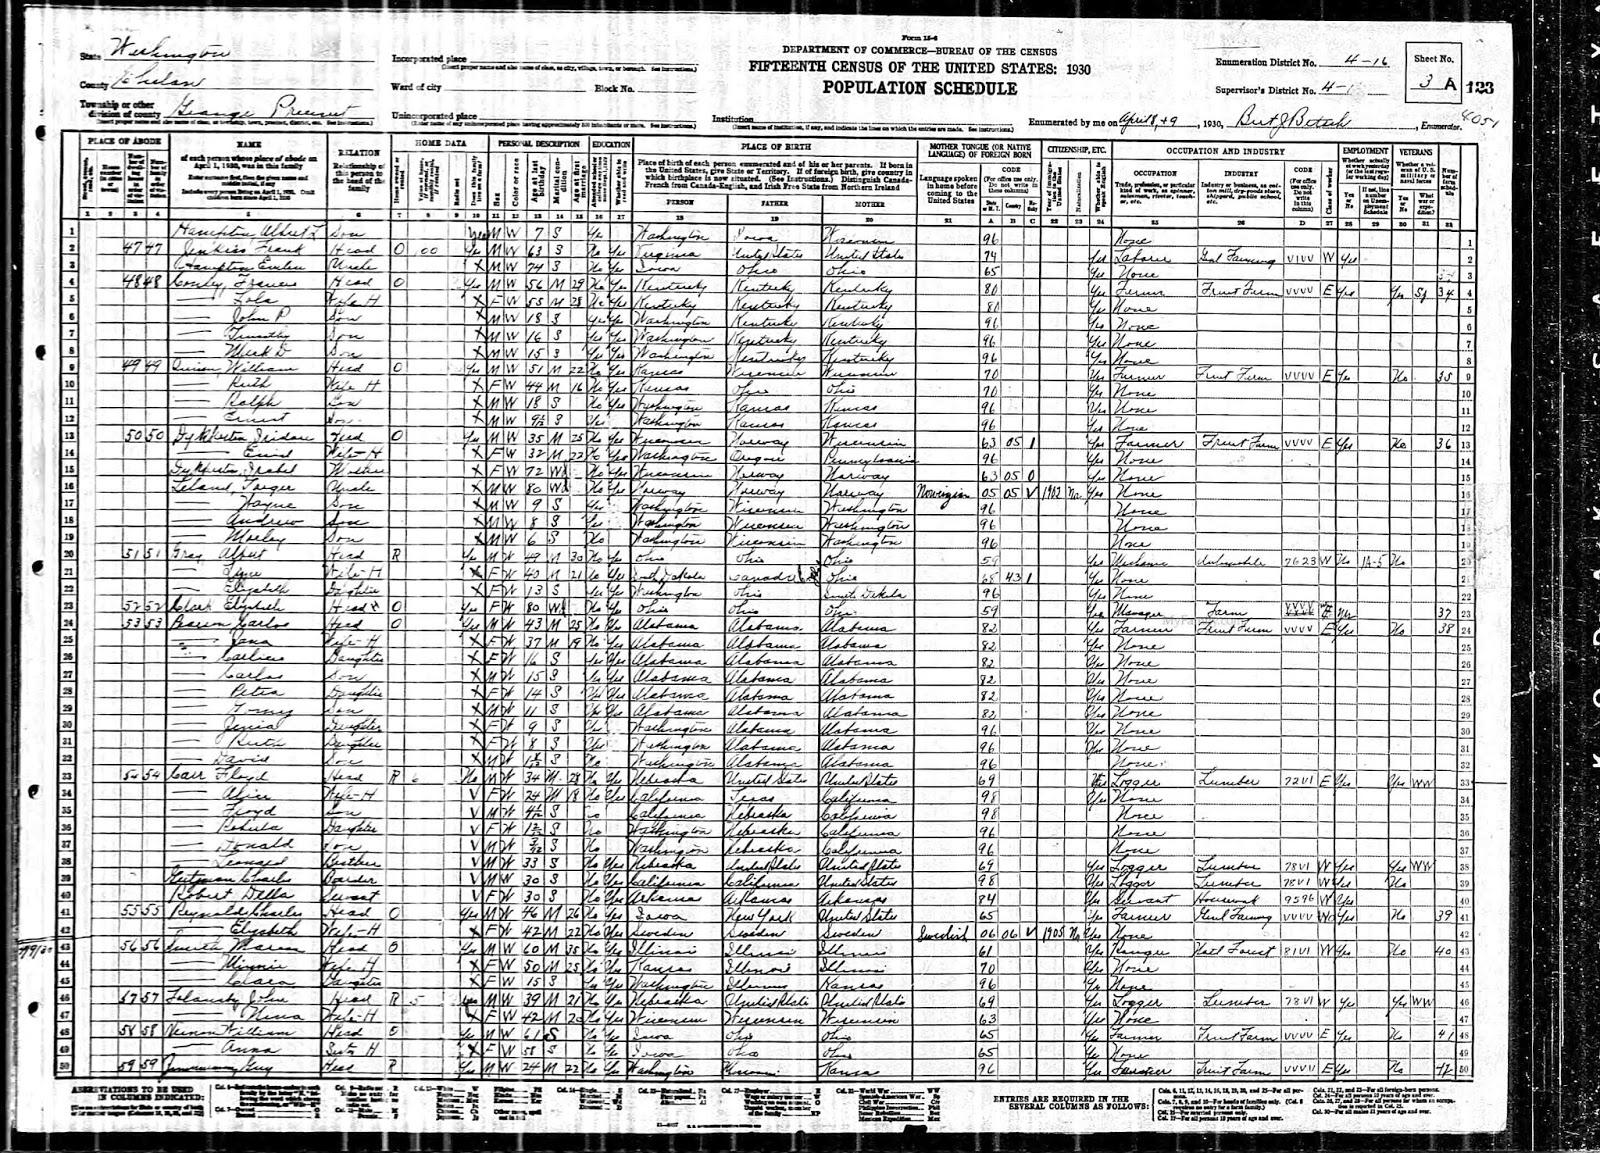 Torgerleland Censusus Chelanwa